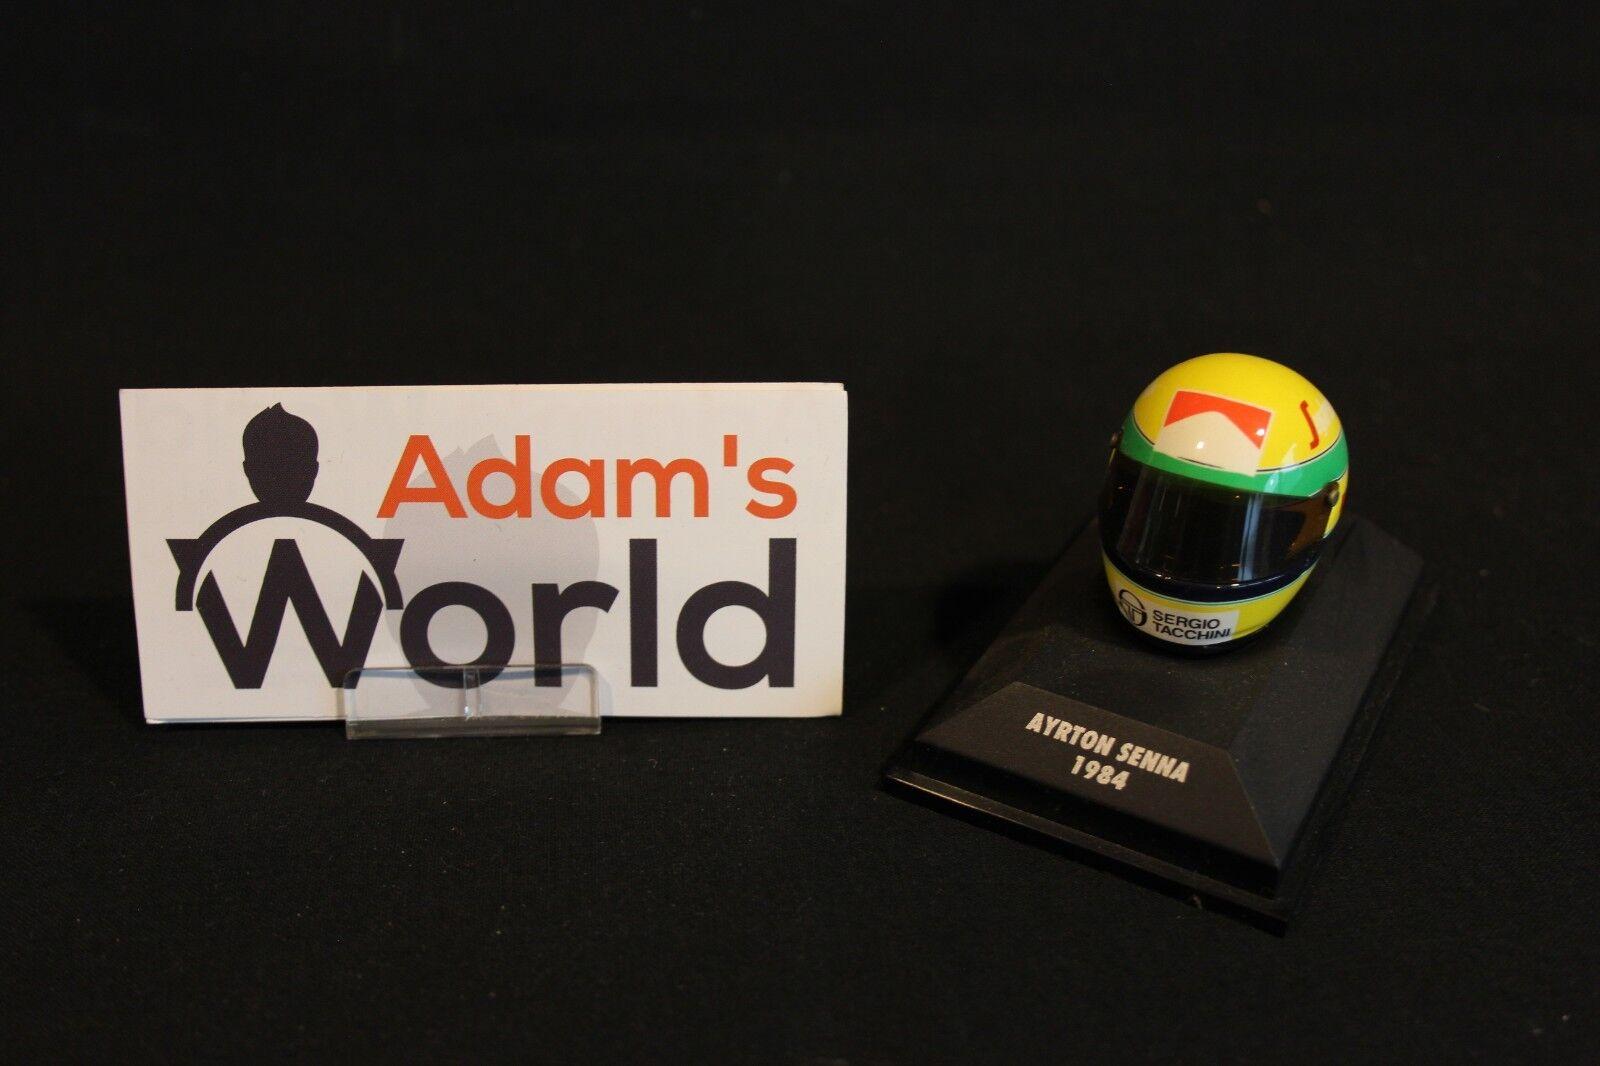 Minichamps Helmet Ayrton Senna (BRA) 1984 1 8 Toleman F1 (MM1)